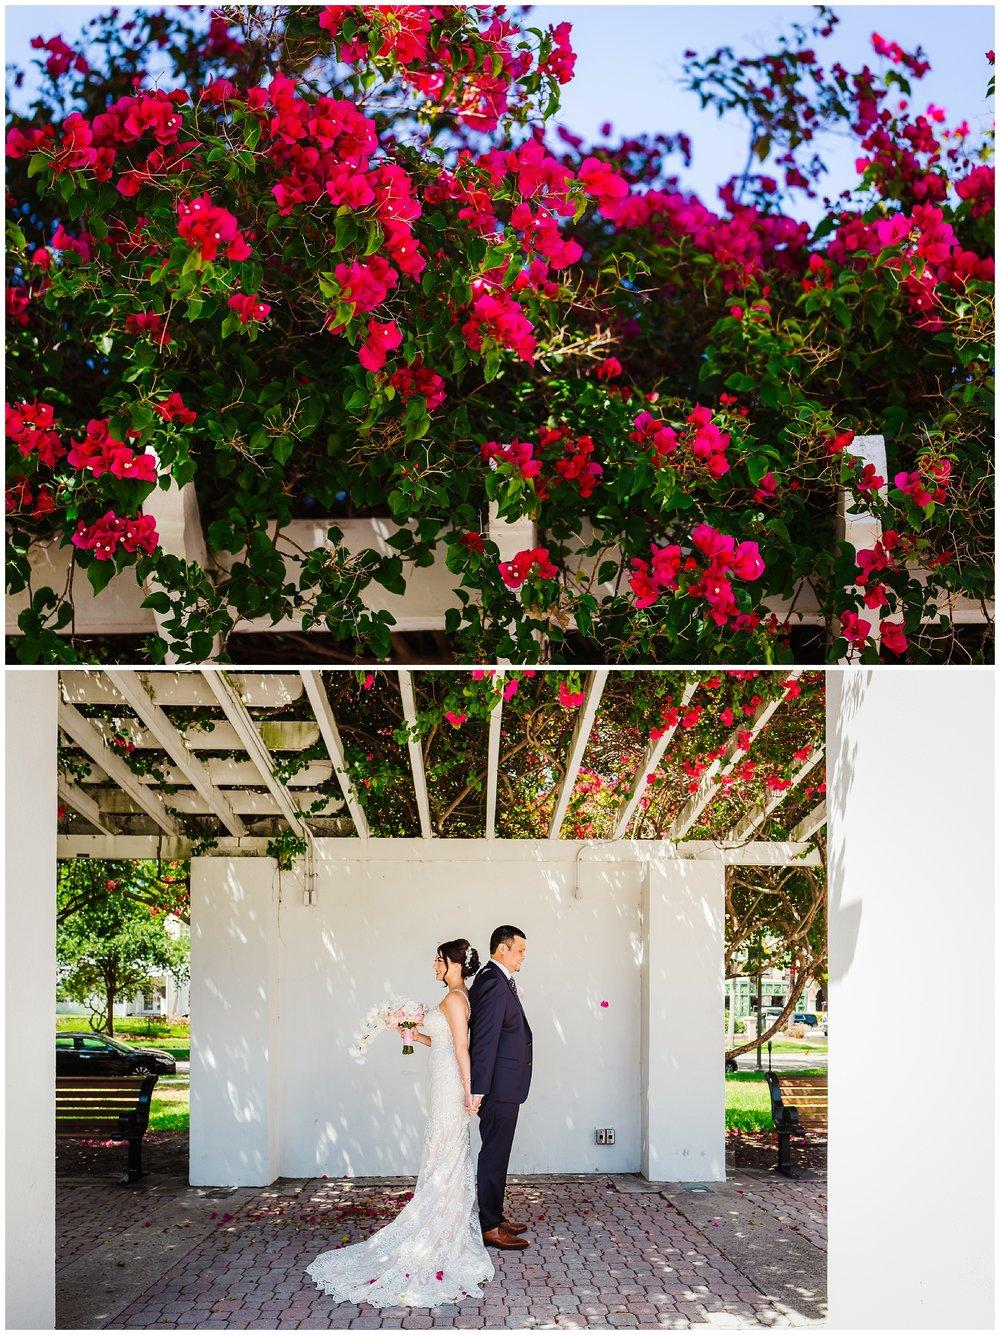 vinoy-sunset-ballroom-rainy-day-wedding-photography-orchids-trinidad-flawless-fetes-ashlee-hamon_0104.jpg